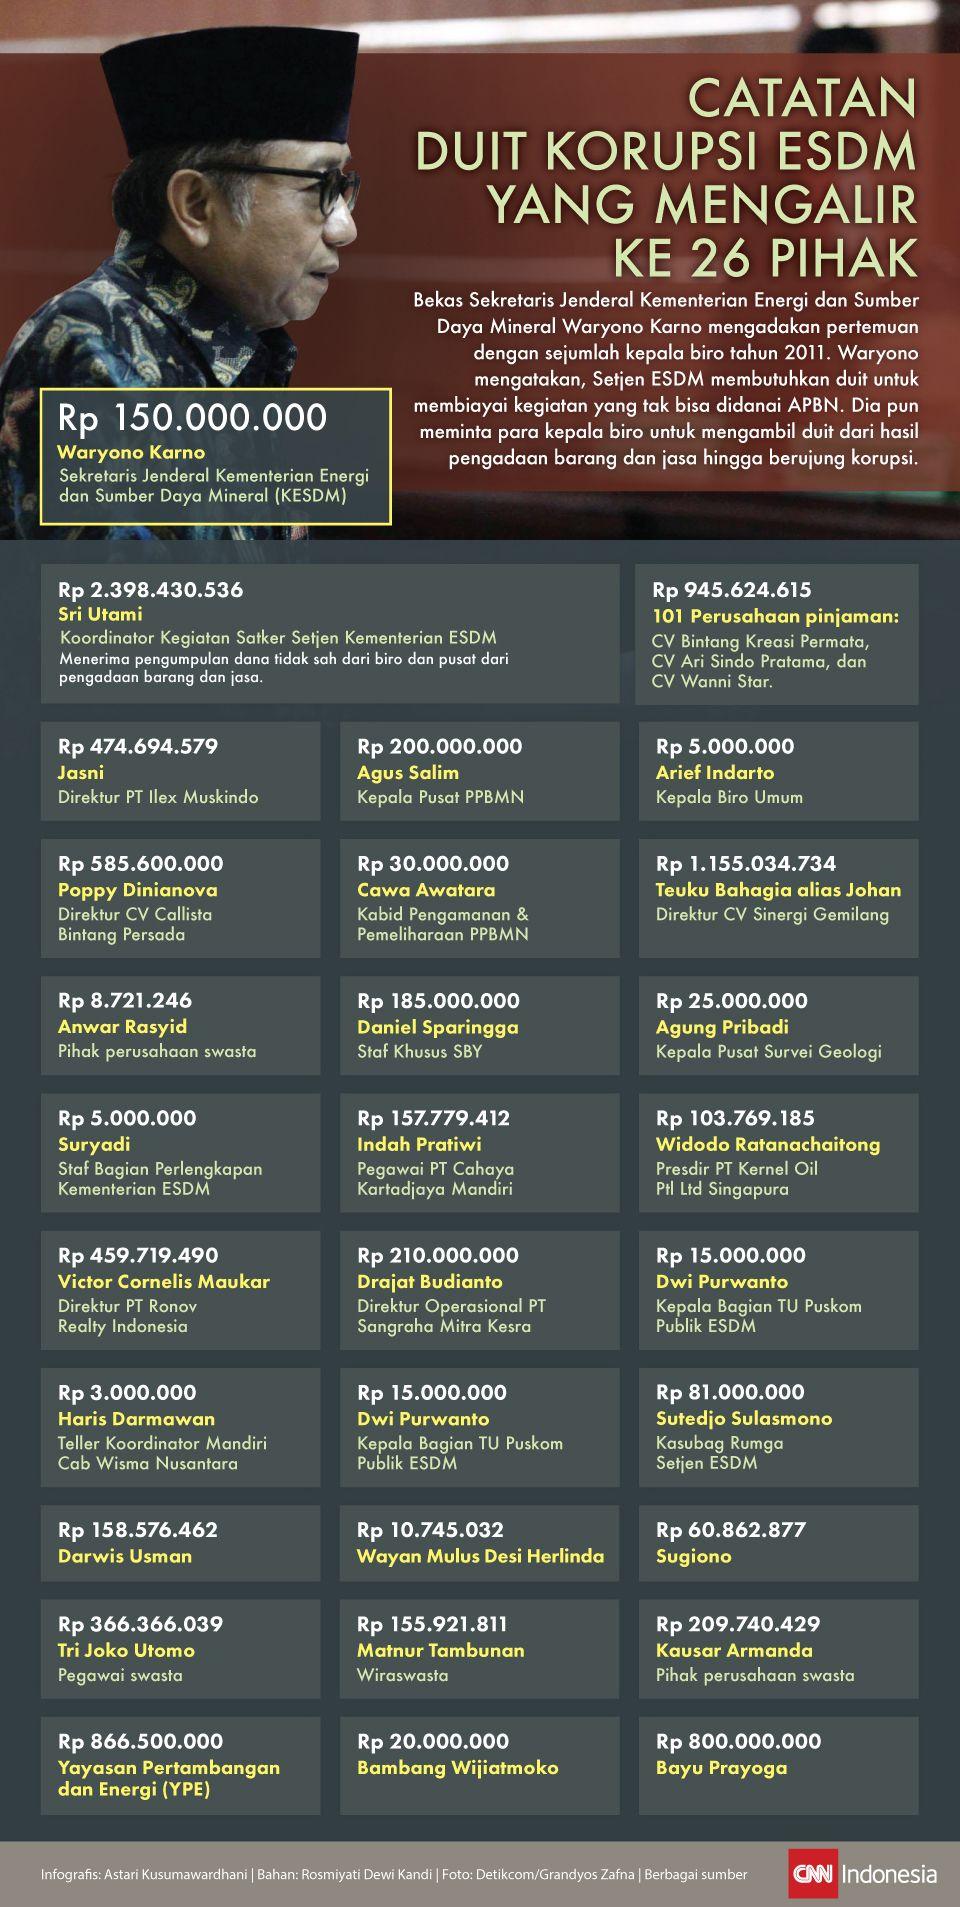 Catatan Duit Korupsi ESDM yang Mengalir ke 26 Pihak